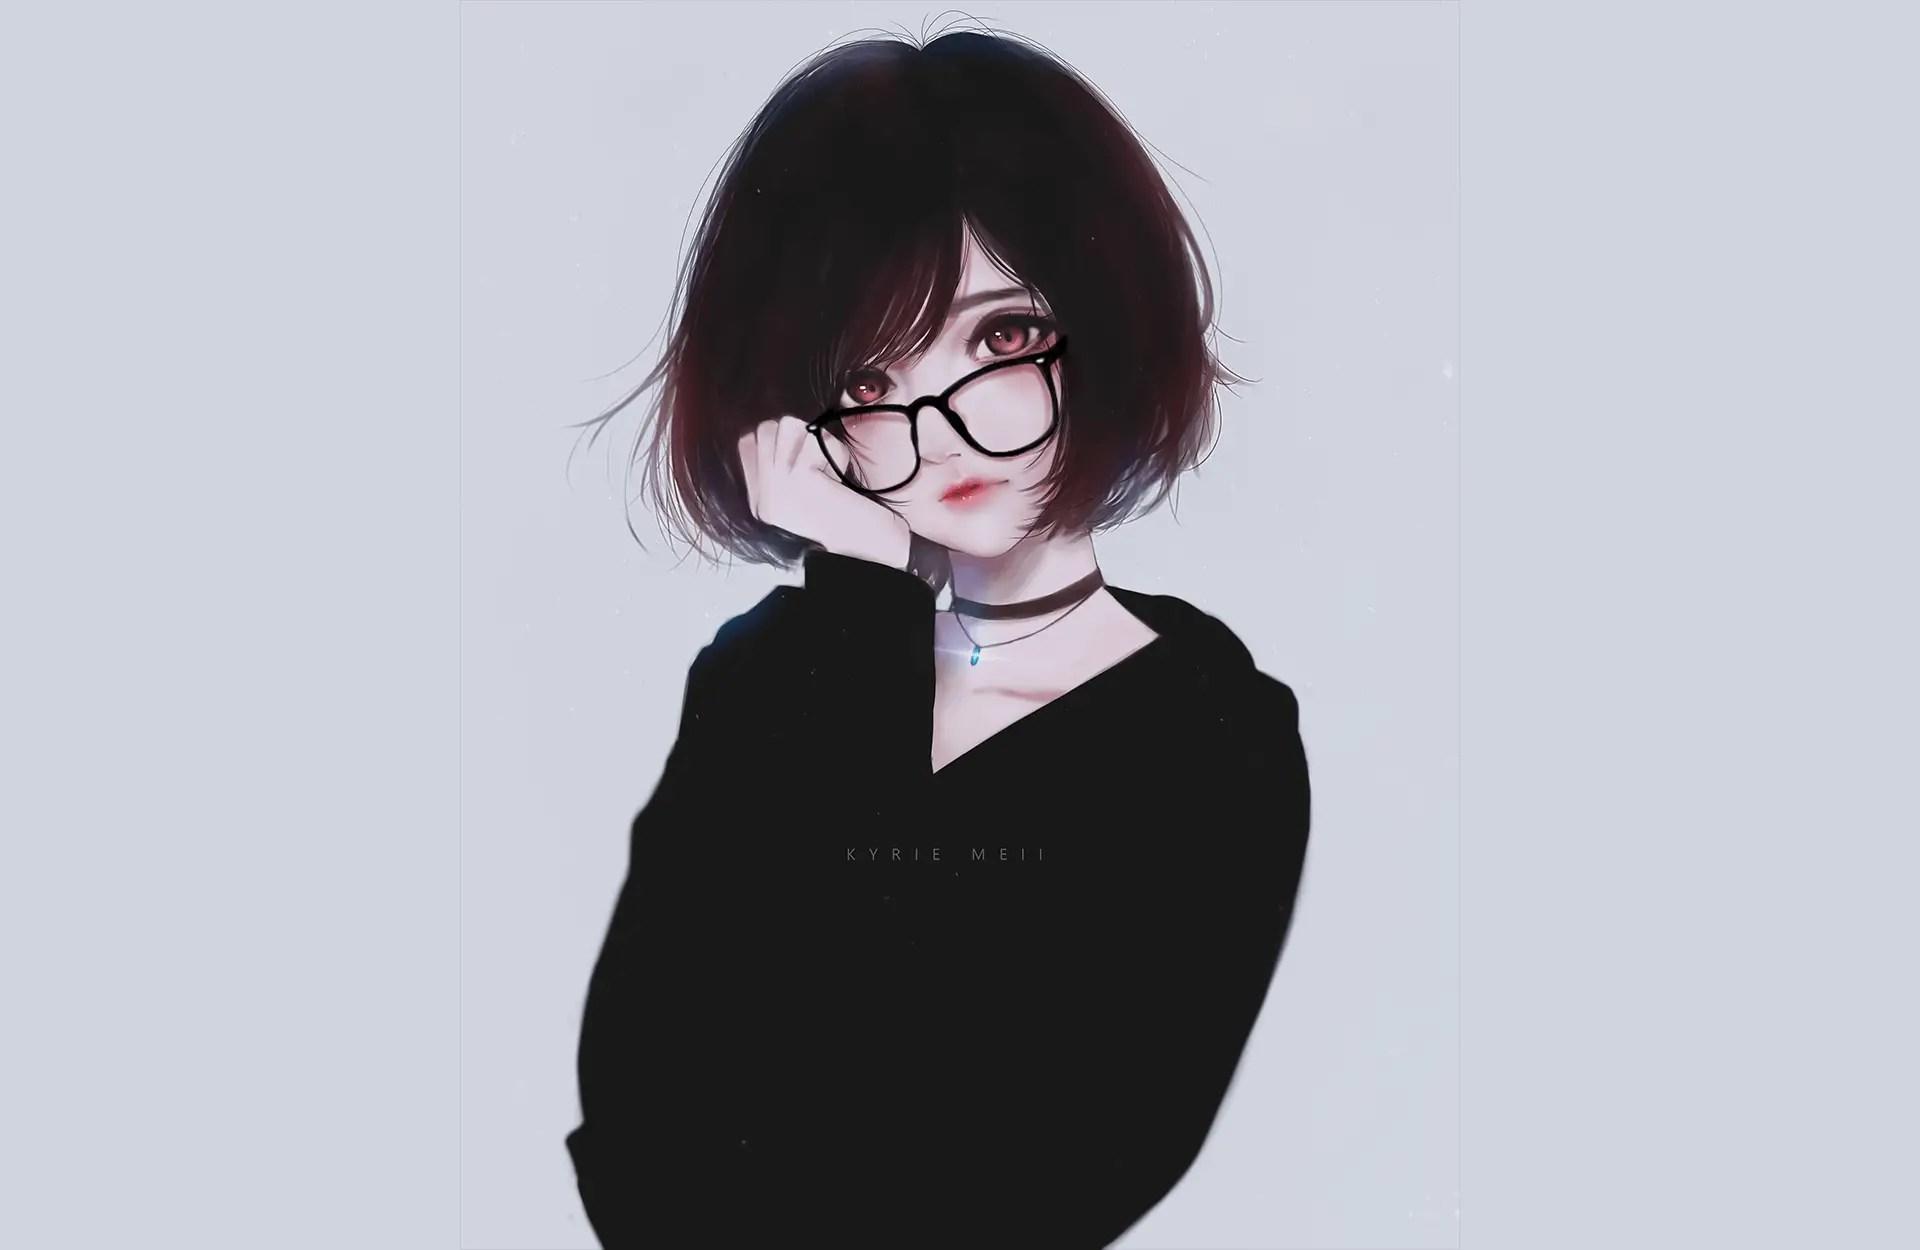 18 Cute Anime Girls With Glasses Chosen by Japan   My Otaku World